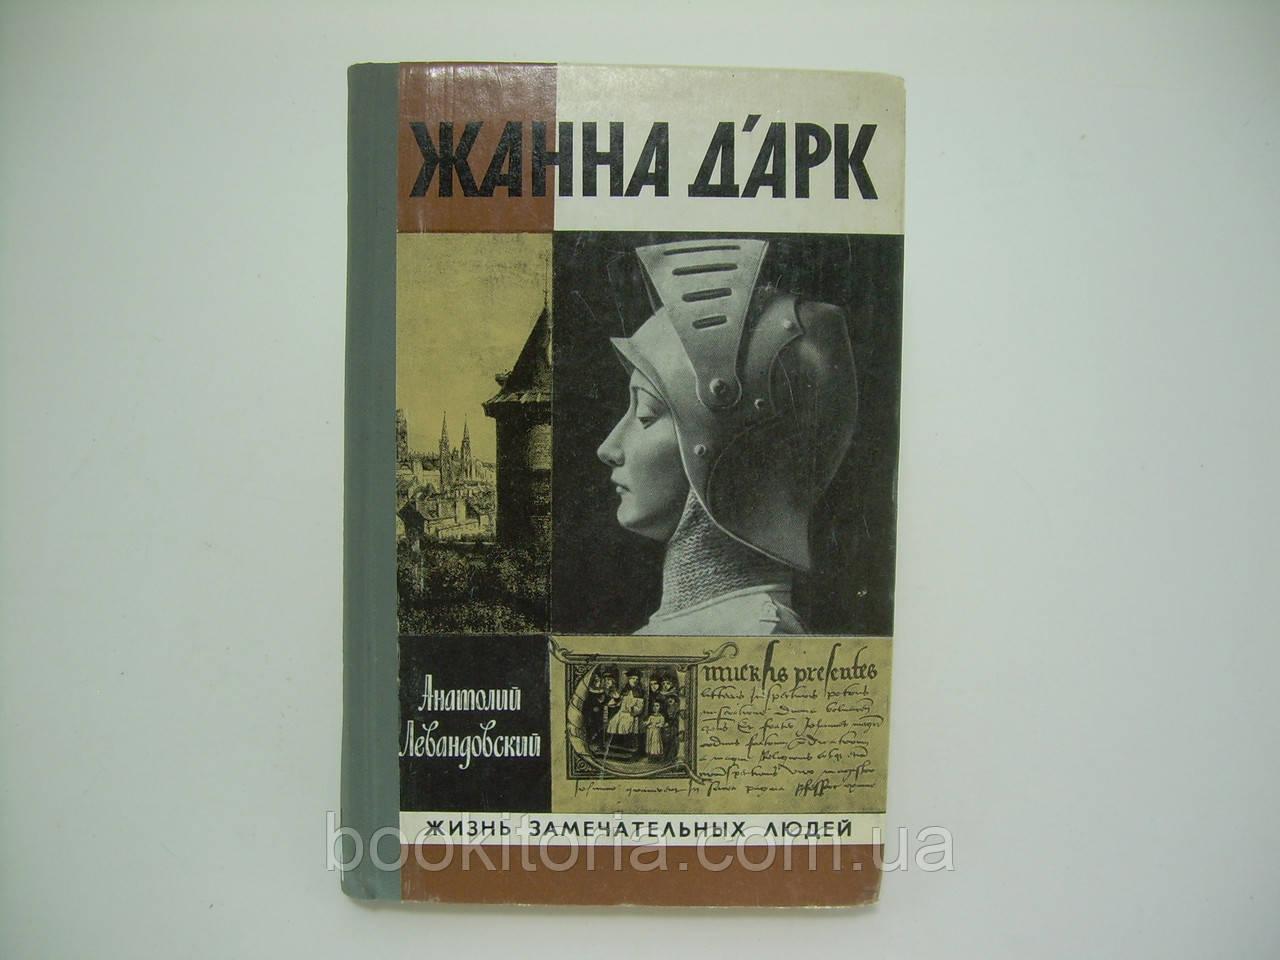 Левандовский А. Жанна д`Арк (б/у).